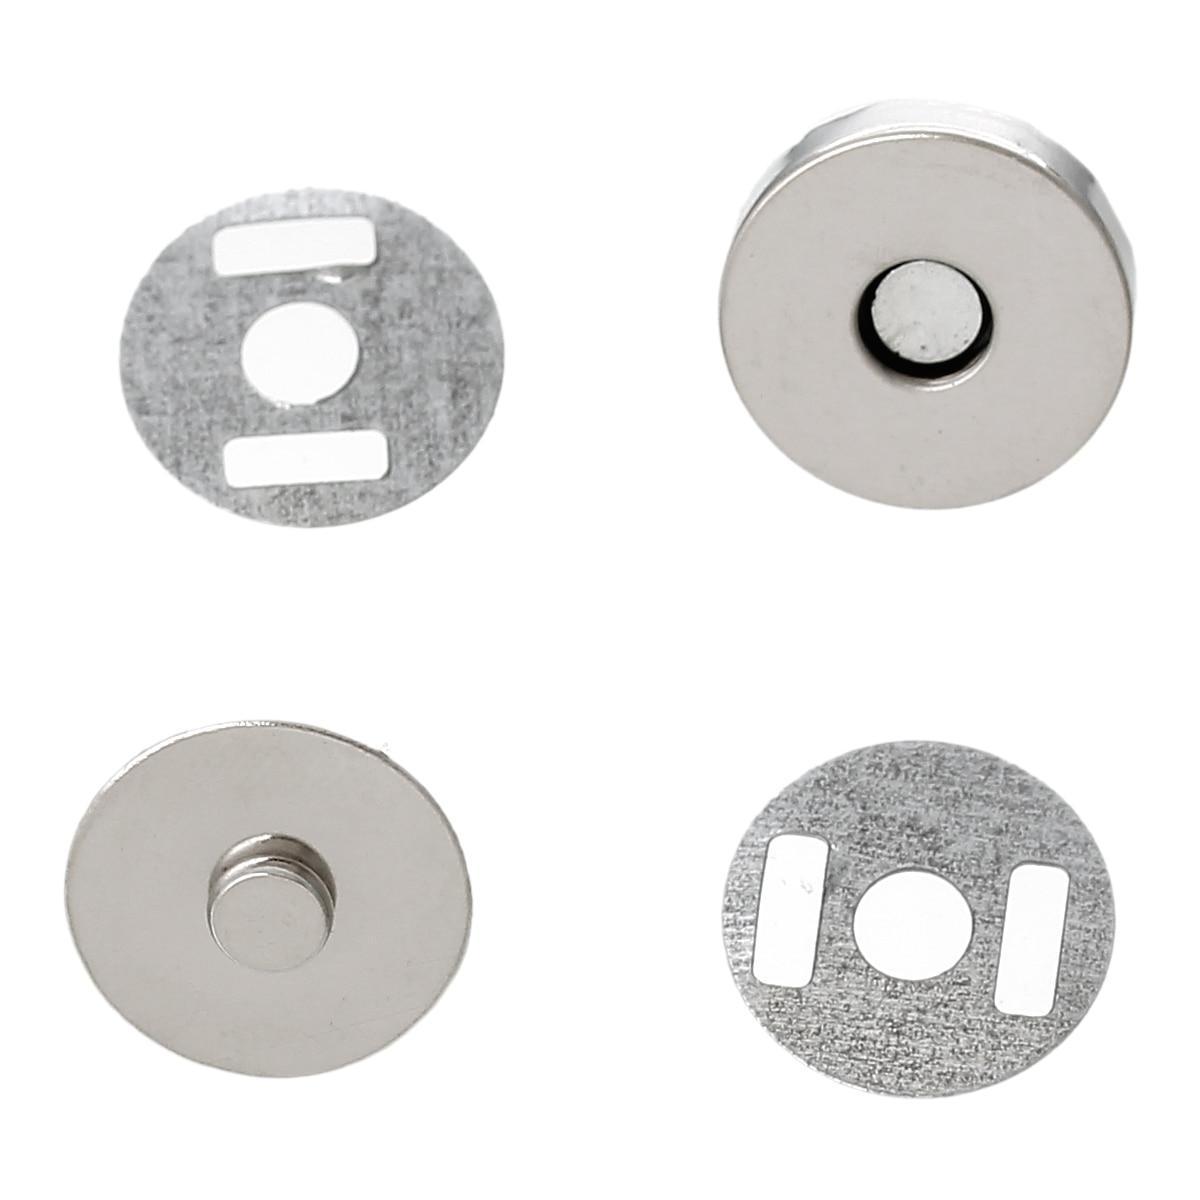 "DoreenBeads 20 Sets dull silver color Magnetic Purse Snap Clasps/ Closure for Purse Handbag 14mm(4/8"") Dia. (B20766)"